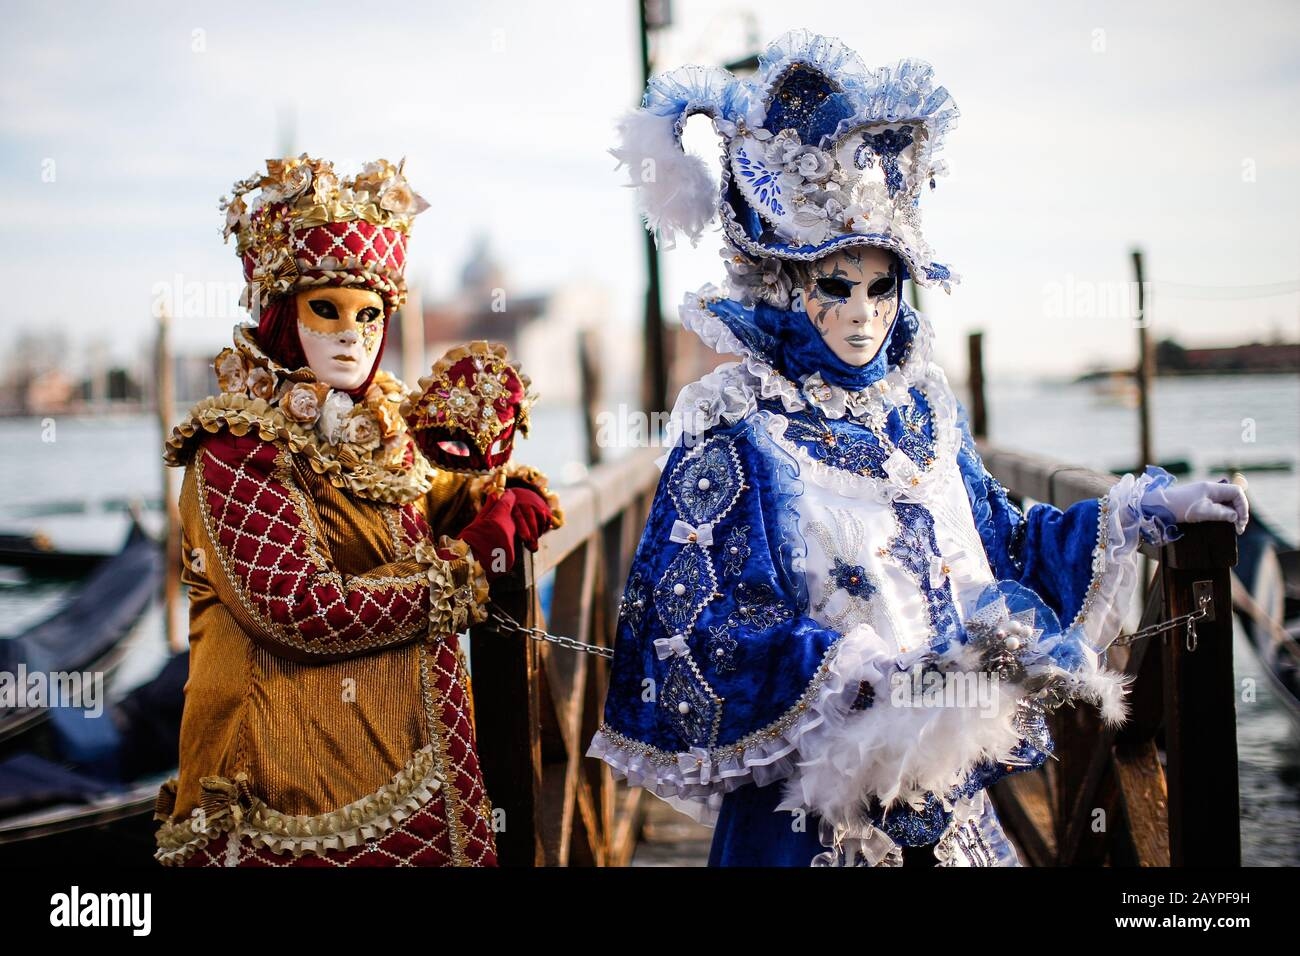 Venice, Italy - February 16, 2020: Masks participants of the 2020 Carnival celebrations St. Mark's Square. Stock Photo